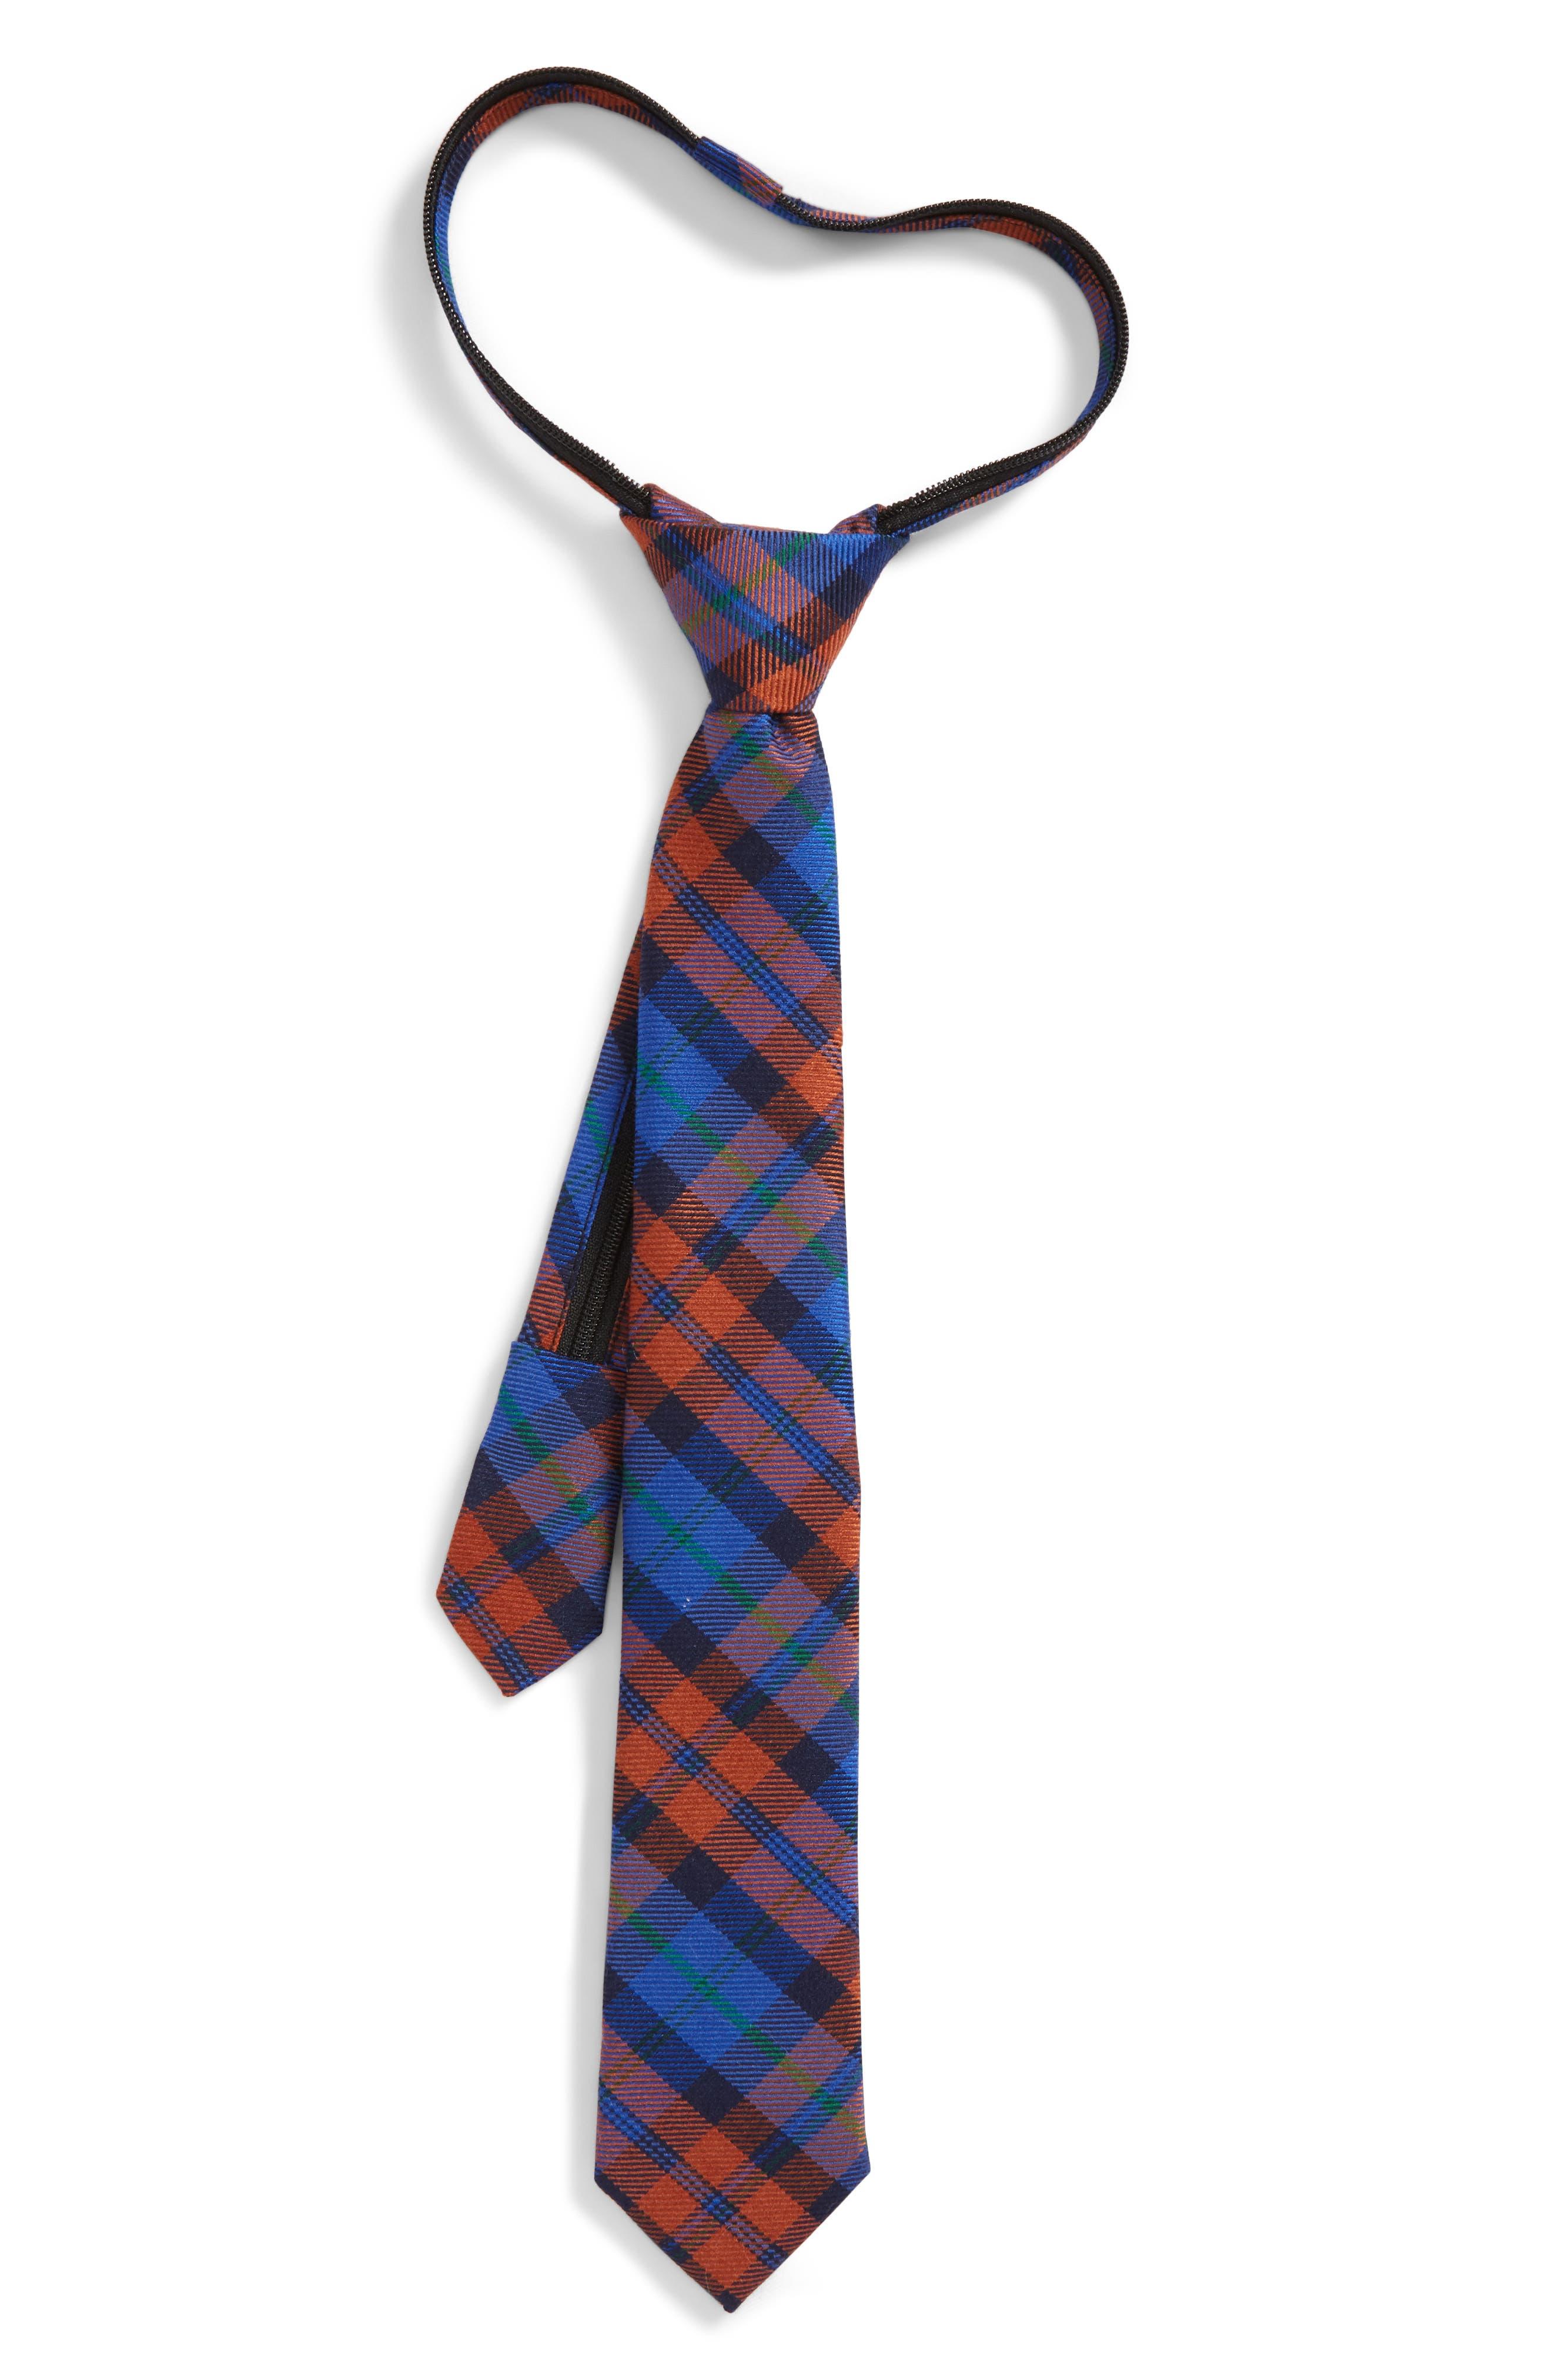 Plaid Wool & Silk Zip Tie,                             Main thumbnail 1, color,                             Orange